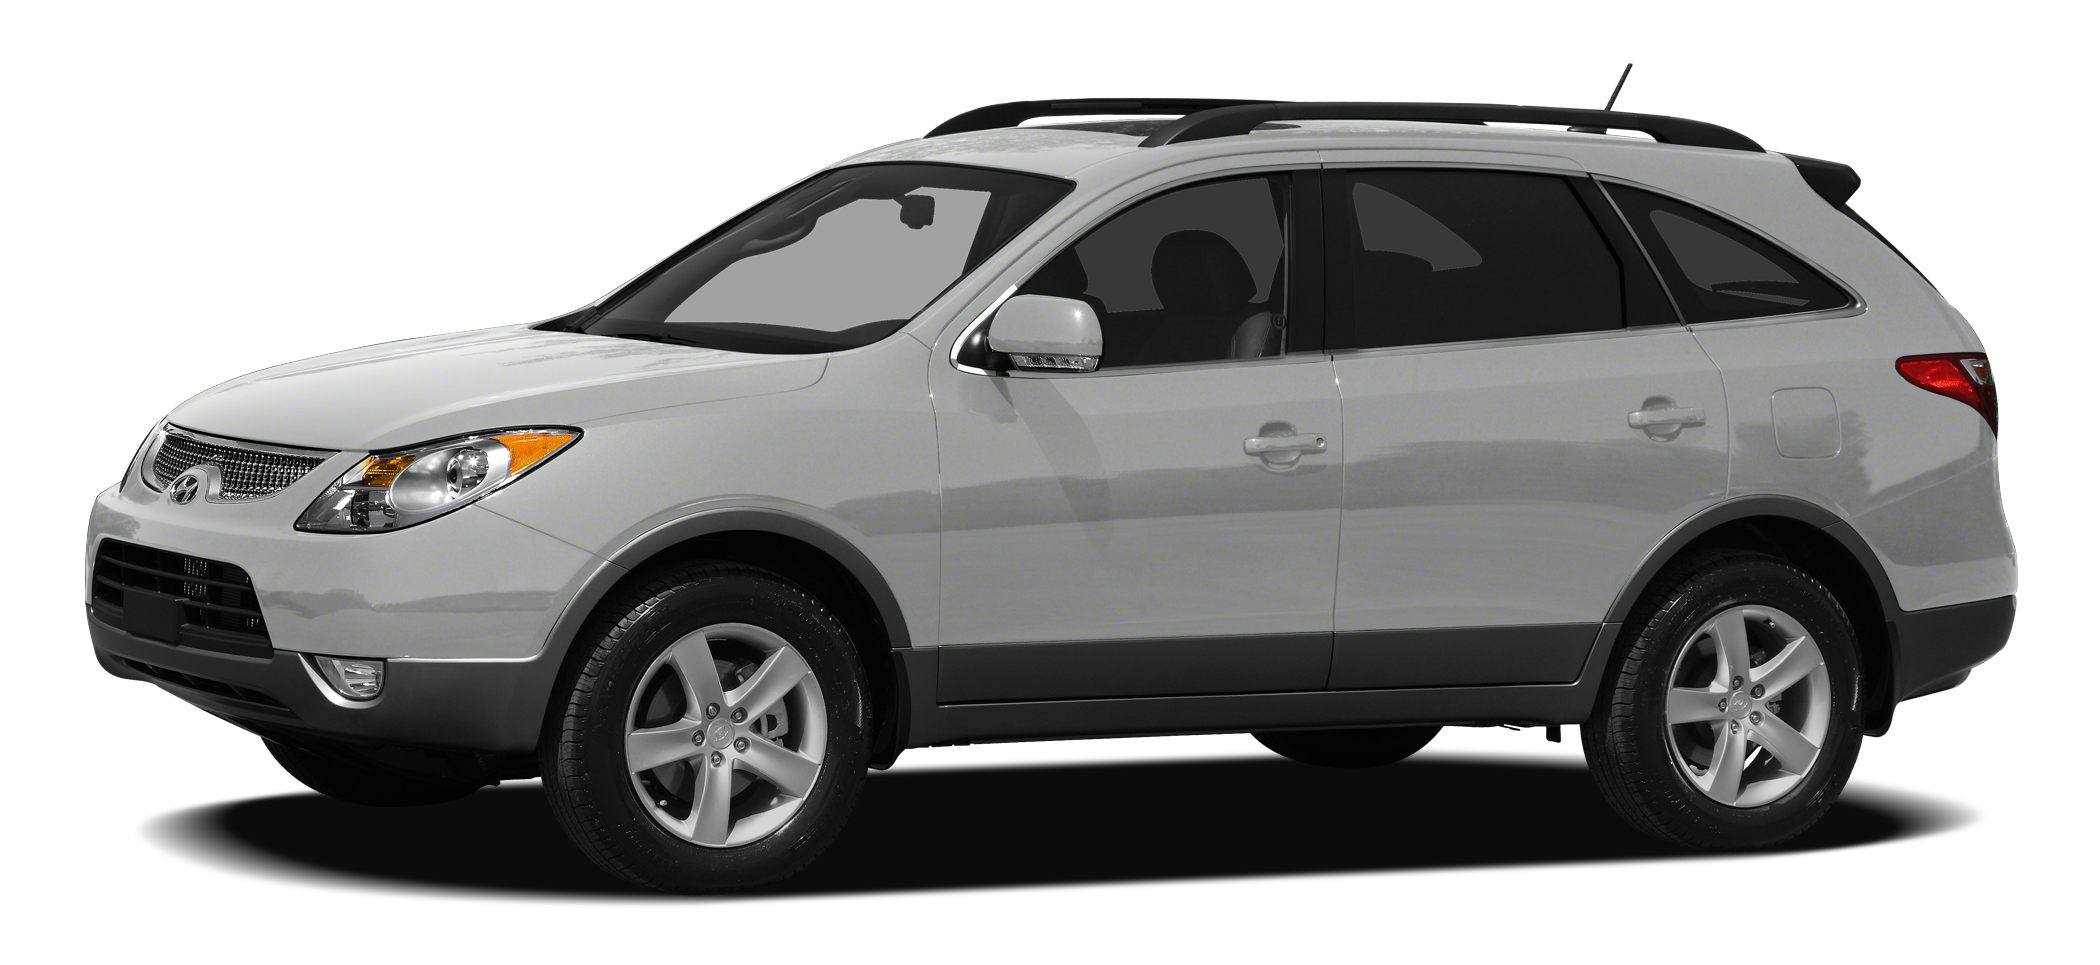 2011 Hyundai Veracruz GLS Miles 46693Color Ultra Silver Metallic Stock RP1067 VIN KM8NU4CC4B